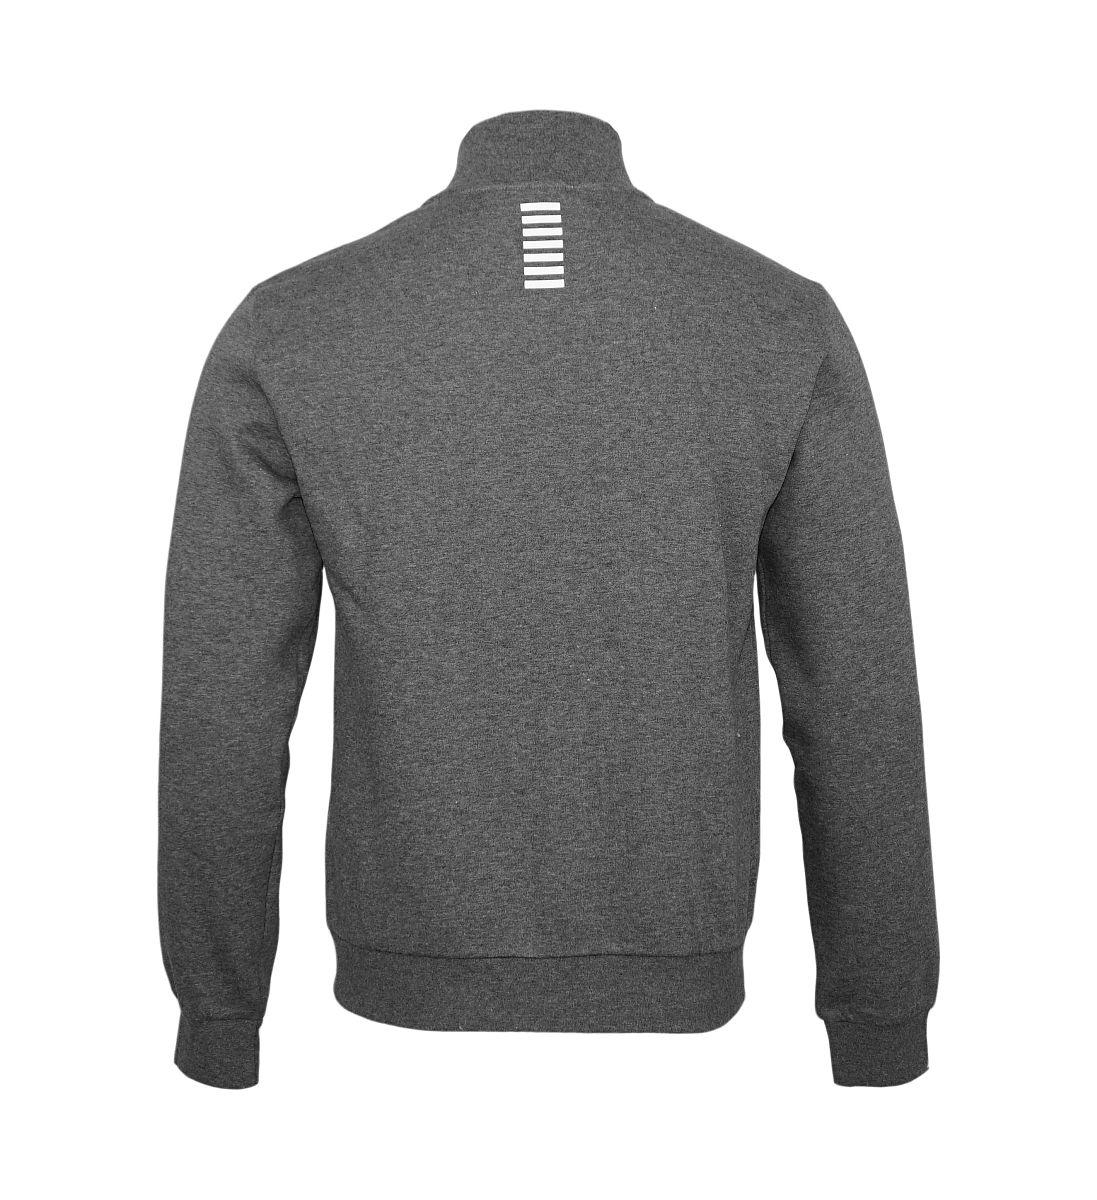 EA7 Empori Armani Sweatshirt Trainingsjacke 6YPM55 PJ07Z 3925 Dark Grey Melange HW17-EATJ1